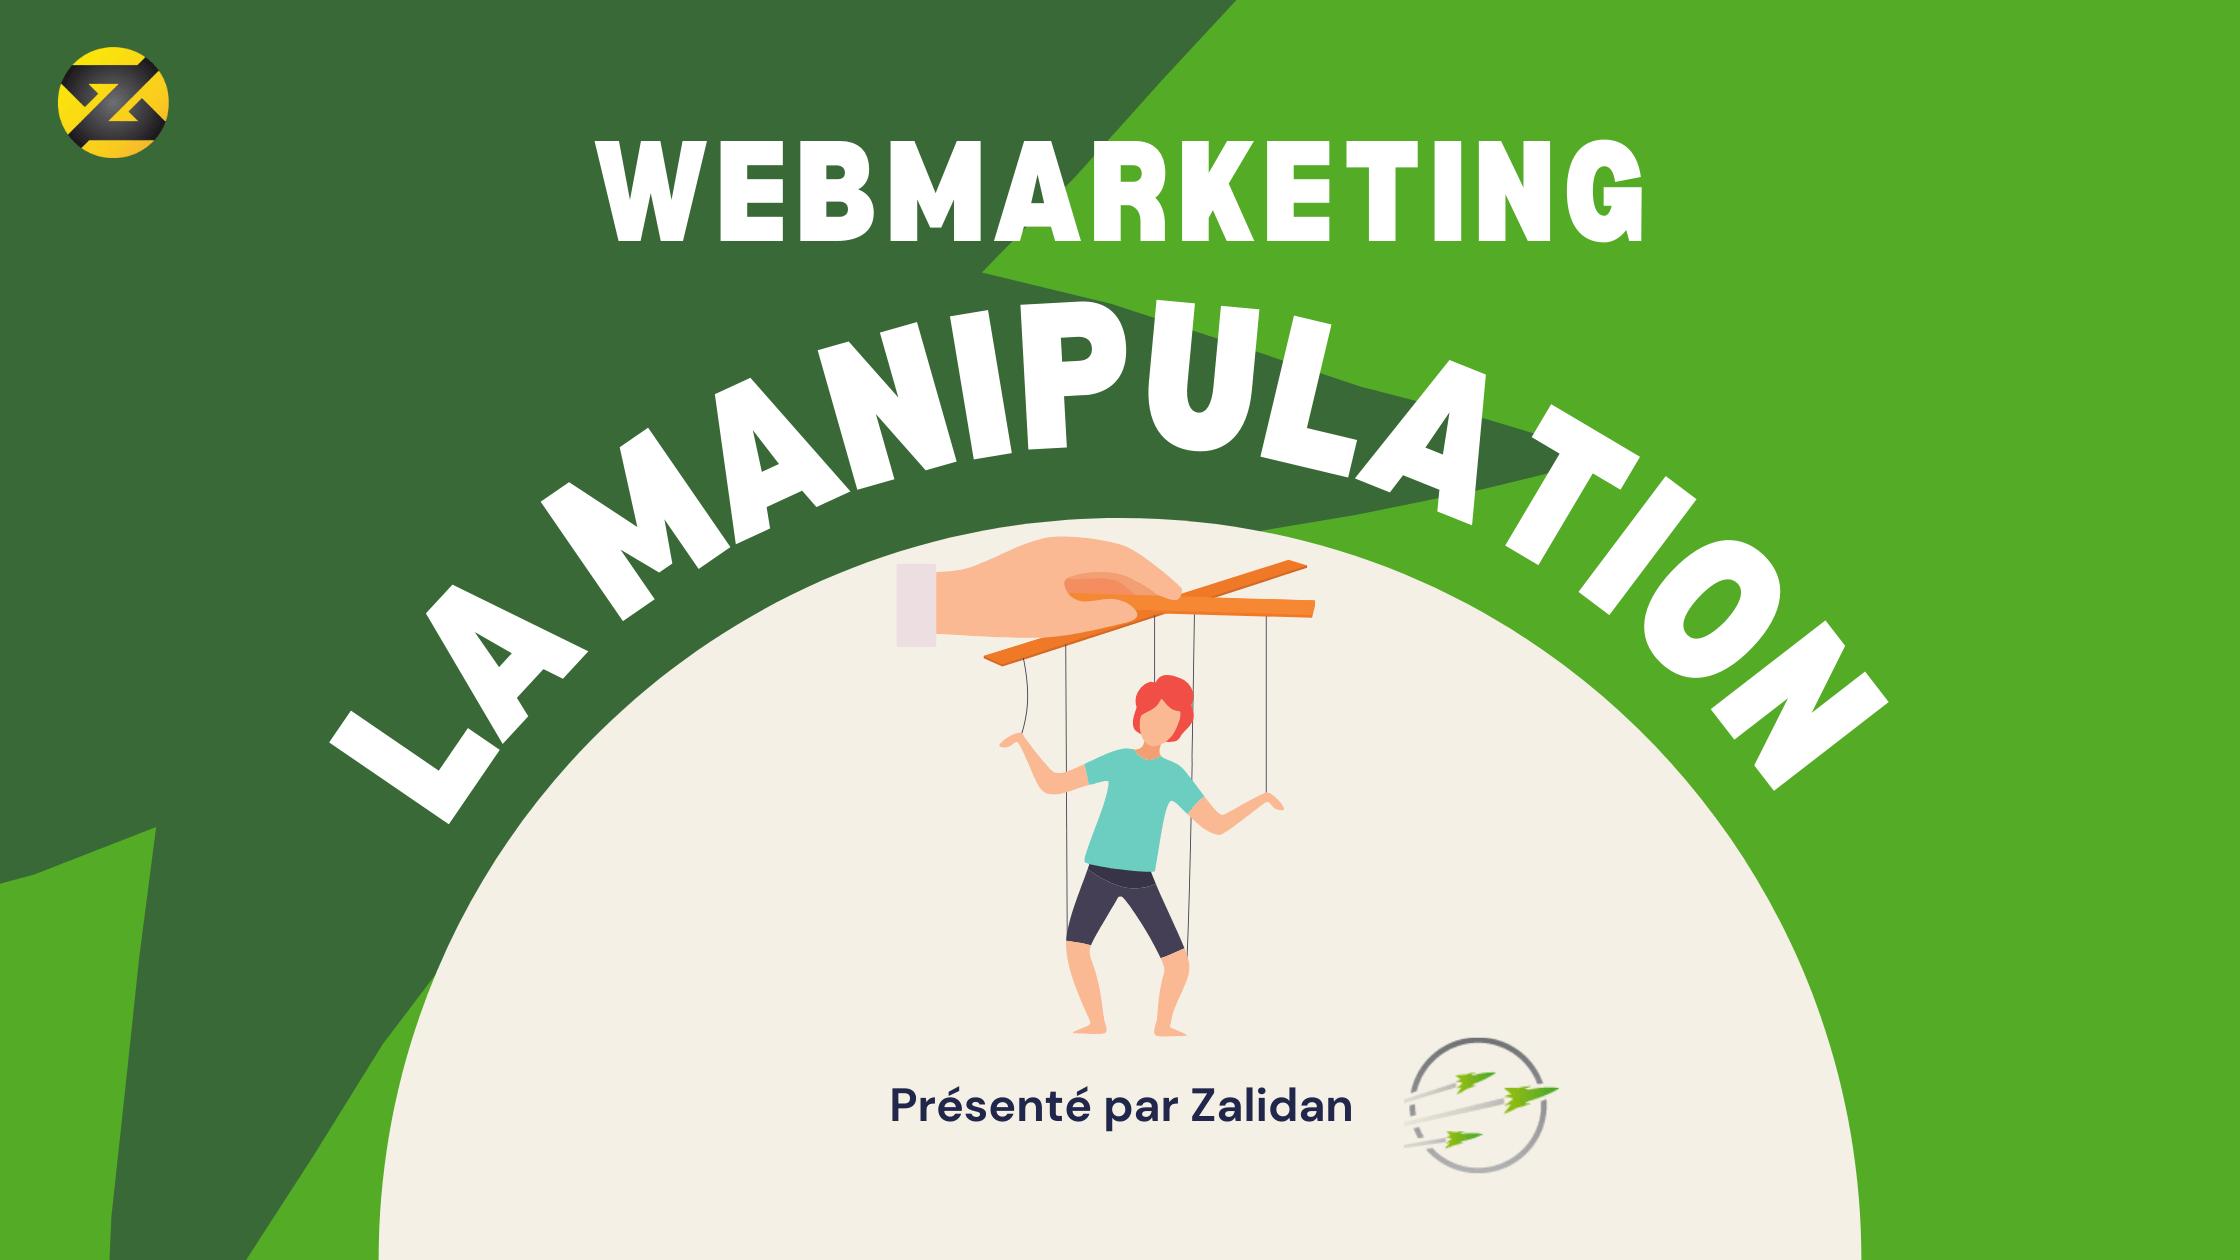 La manipulation en web marketing